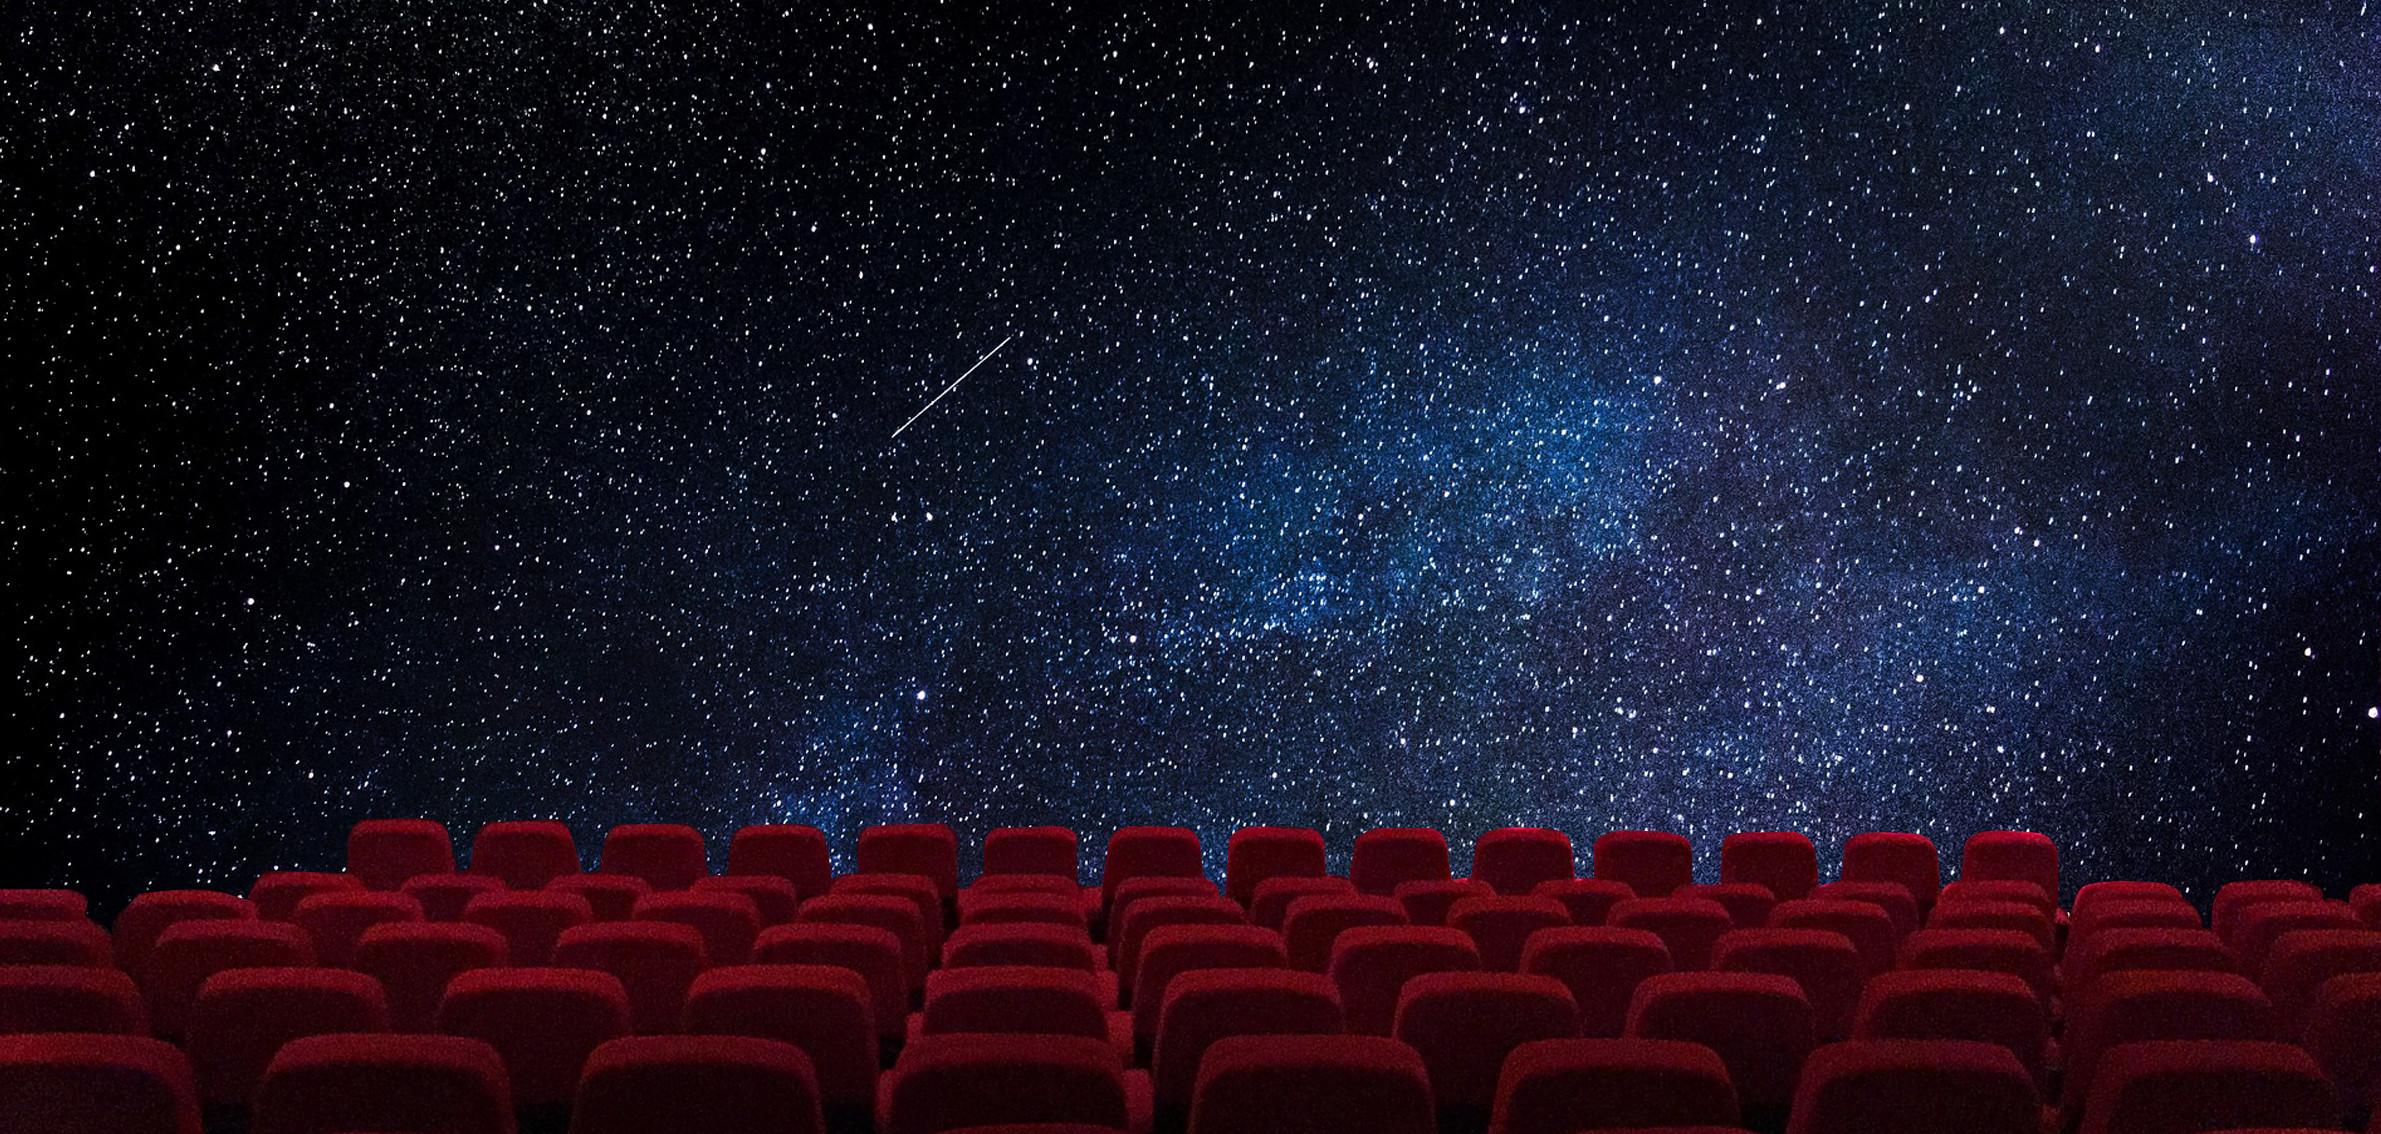 arteleonardo school florence italy cinema under the stars in